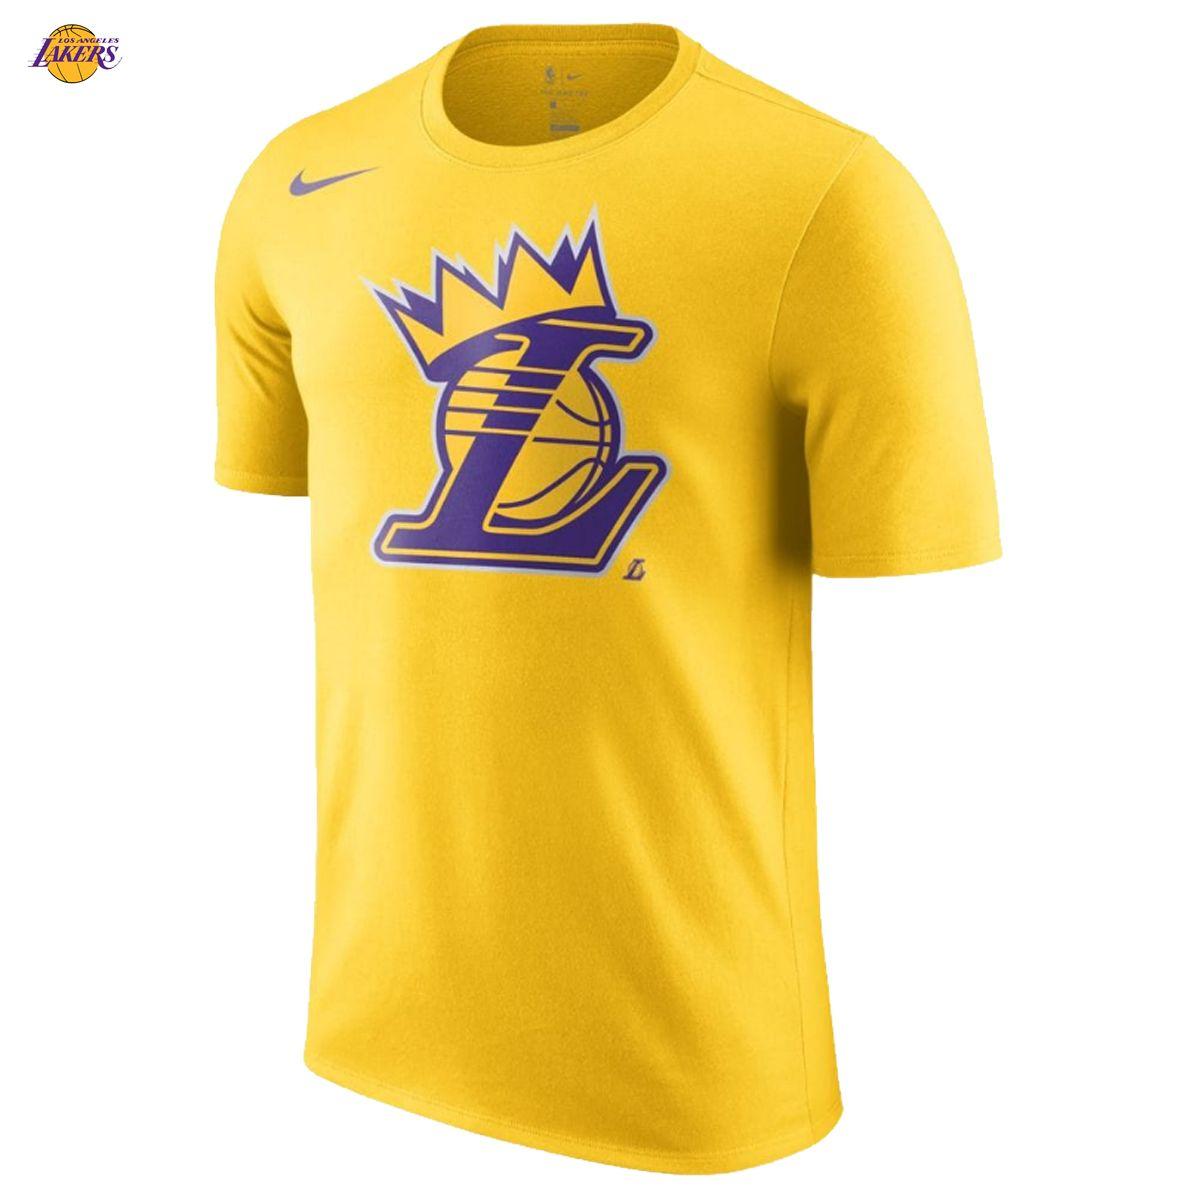 47432248 LeBron James 23 Los Angeles Lakers Nike Shirt Crown King NBA 2018/19 Pride  Yellow/Gold NWT NEW!!! The Los Angeles Lakers Crown Men's NBA T-Shirt, ...